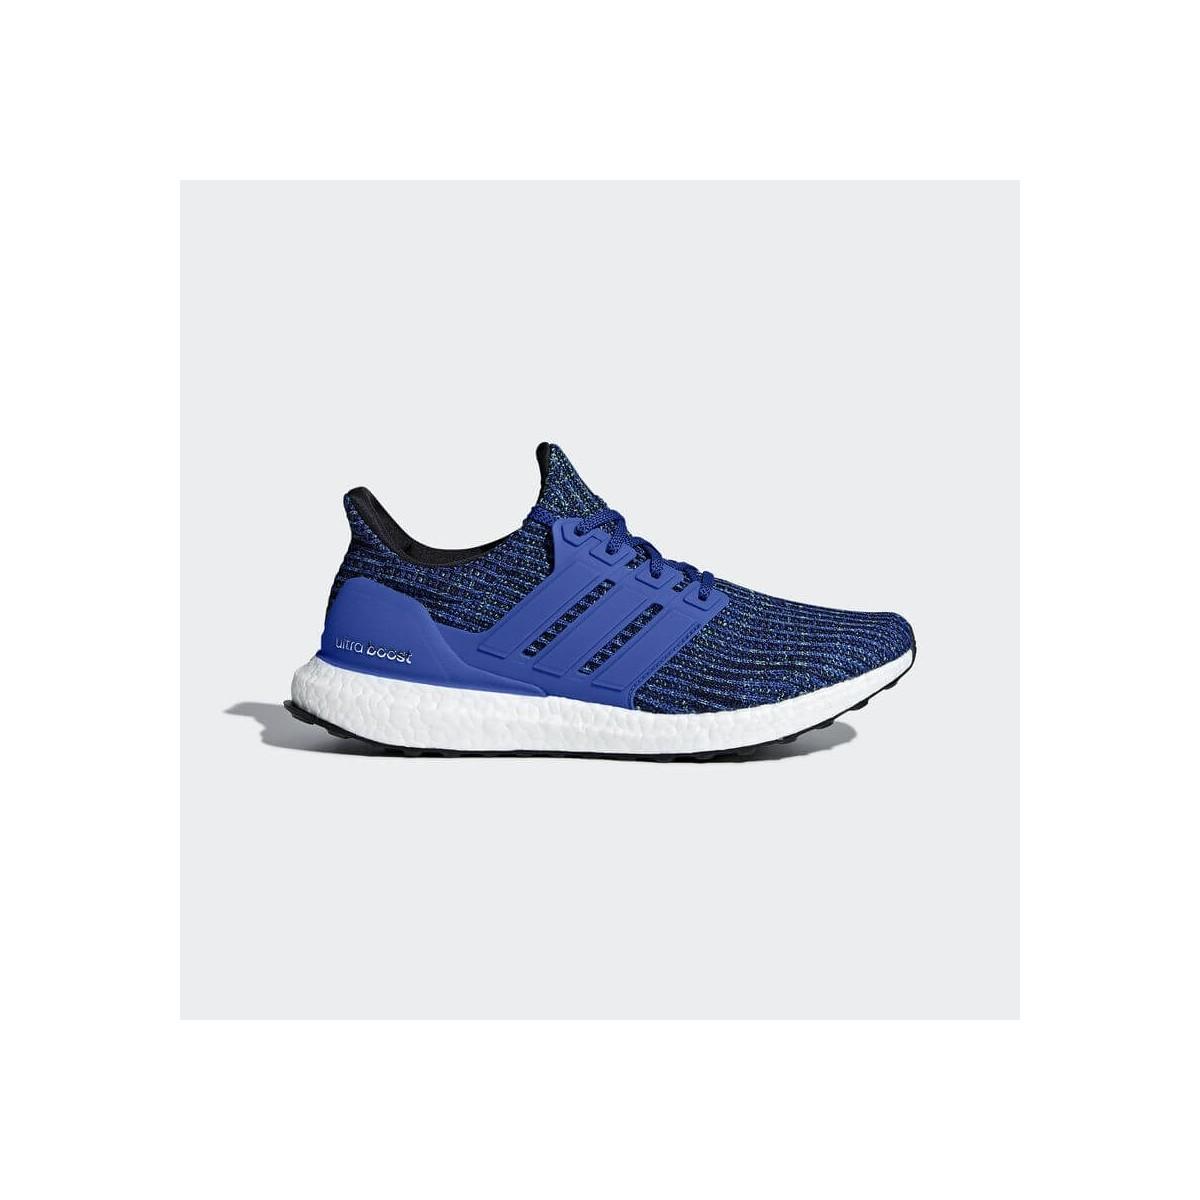 ... Zapatillas Adidas Ultra Boost Azul Hombre OI18 768b3b4ab8cb3